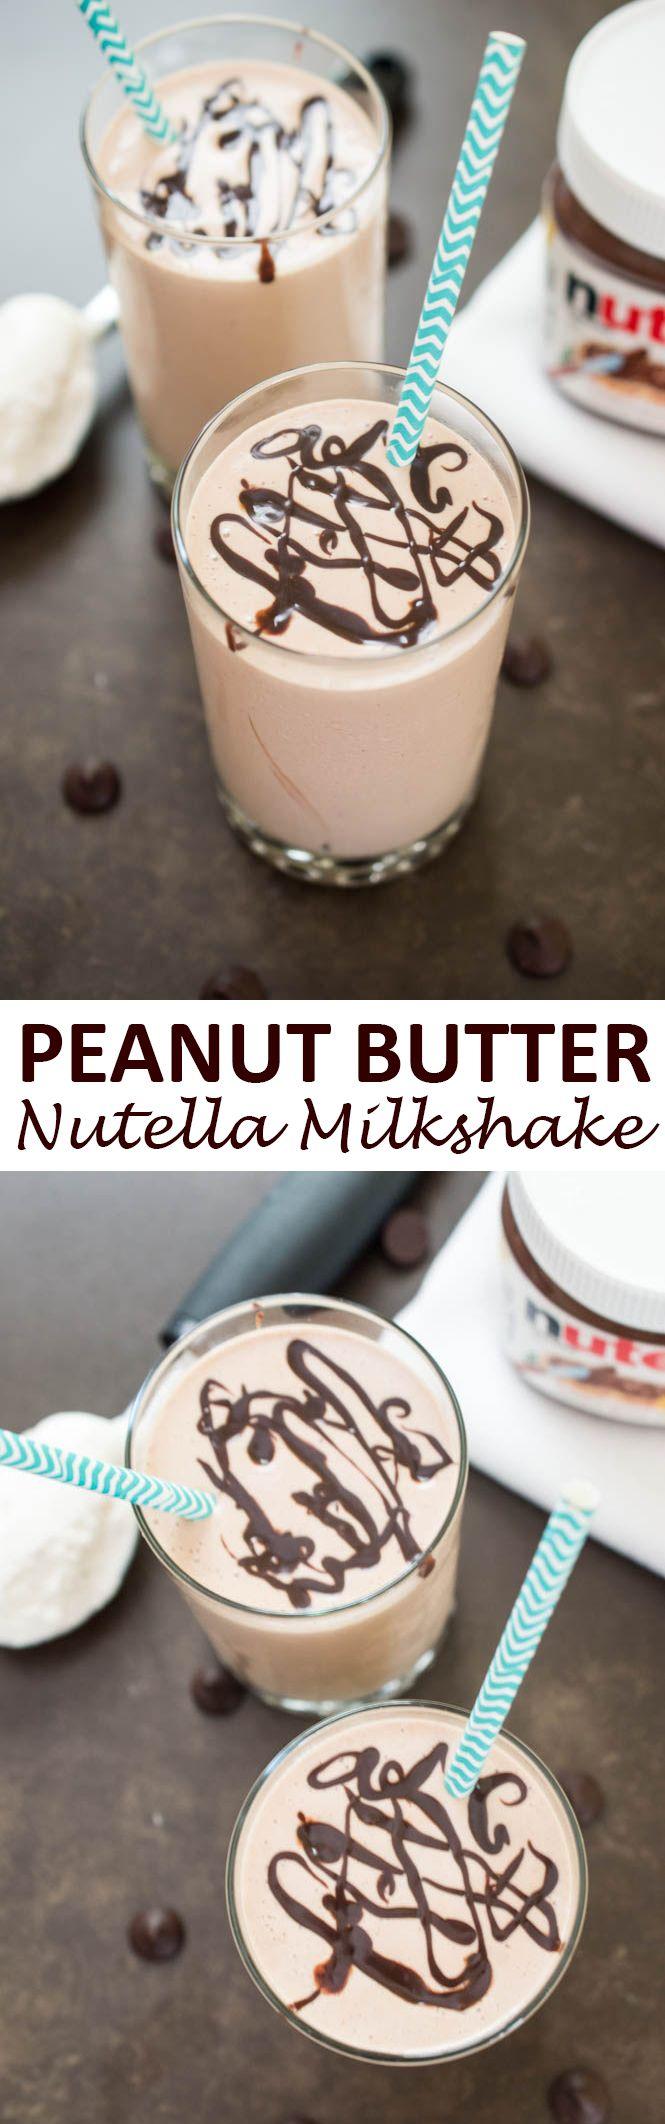 4 ingredient Creamy Peanut Butter & Nutella Milkshake